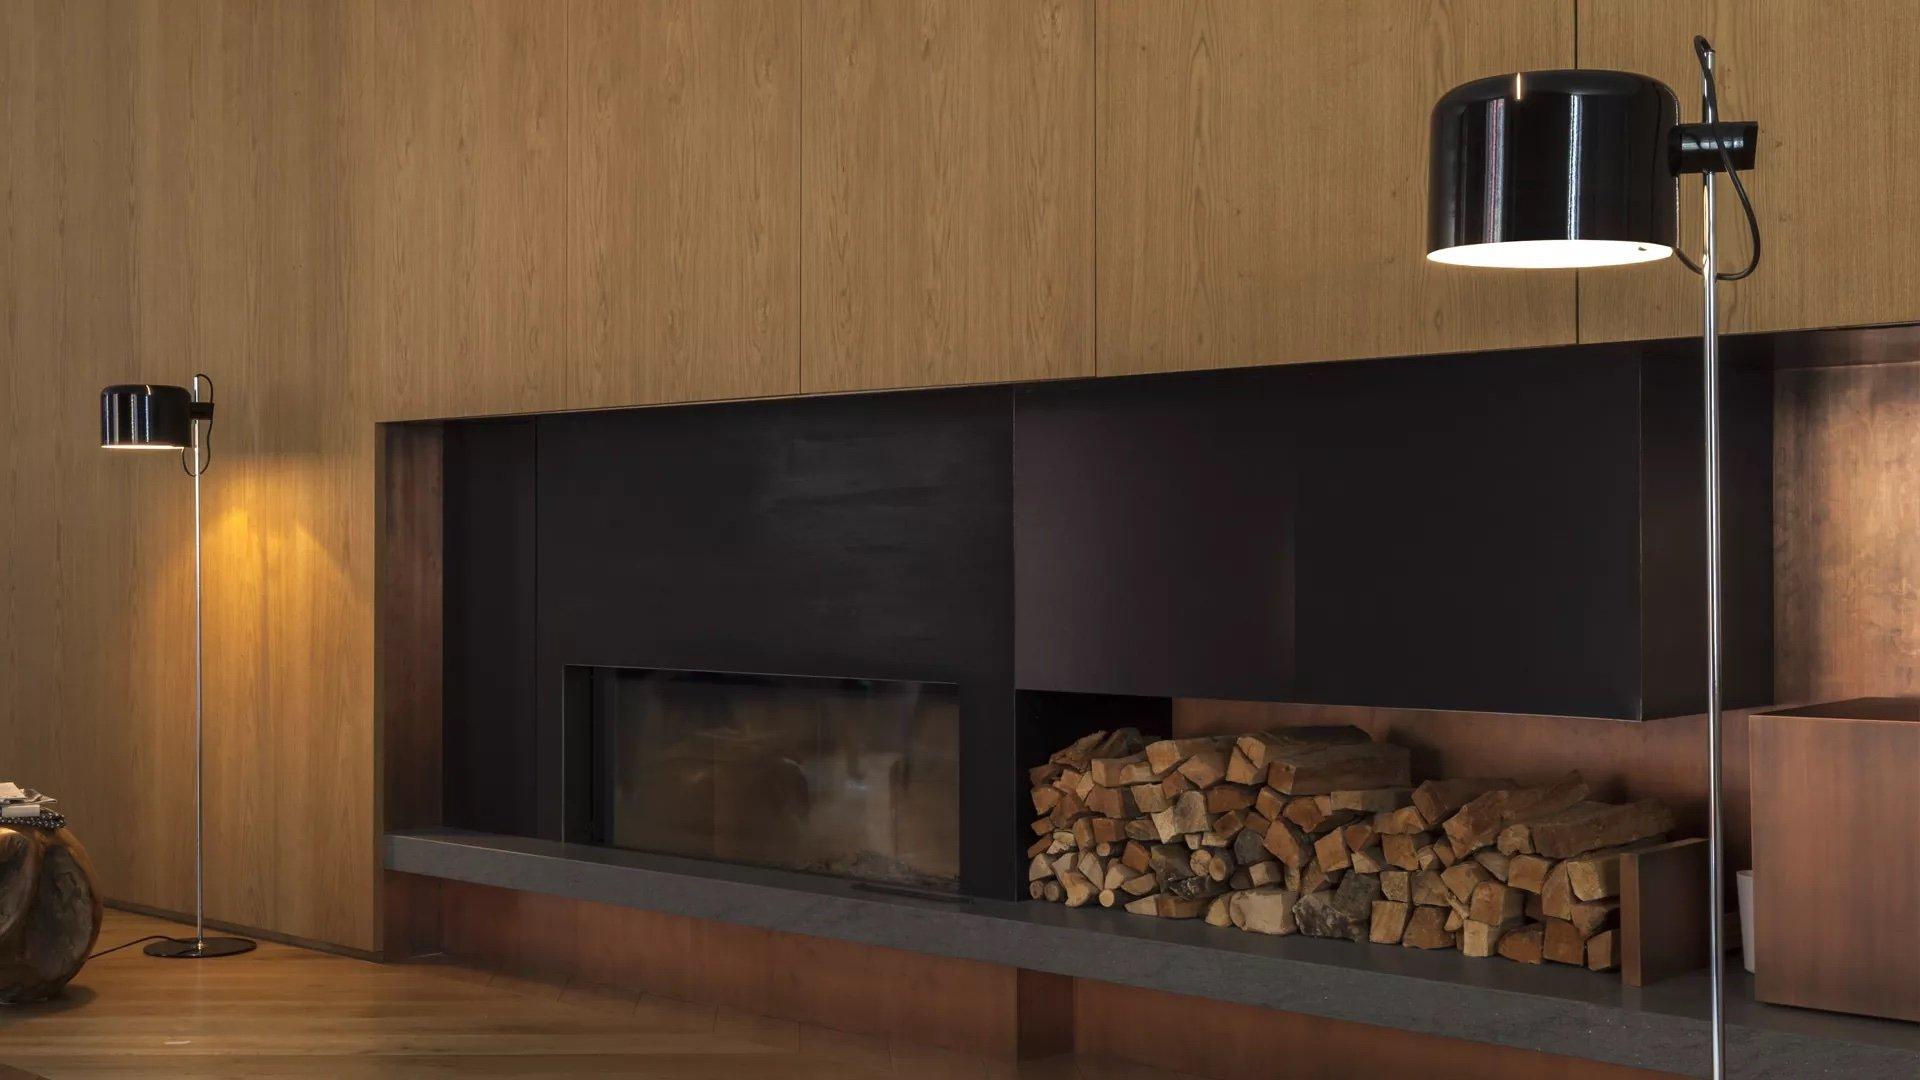 Coupe Floor Lamp lighting from Oluce, designed by Joe Colombo